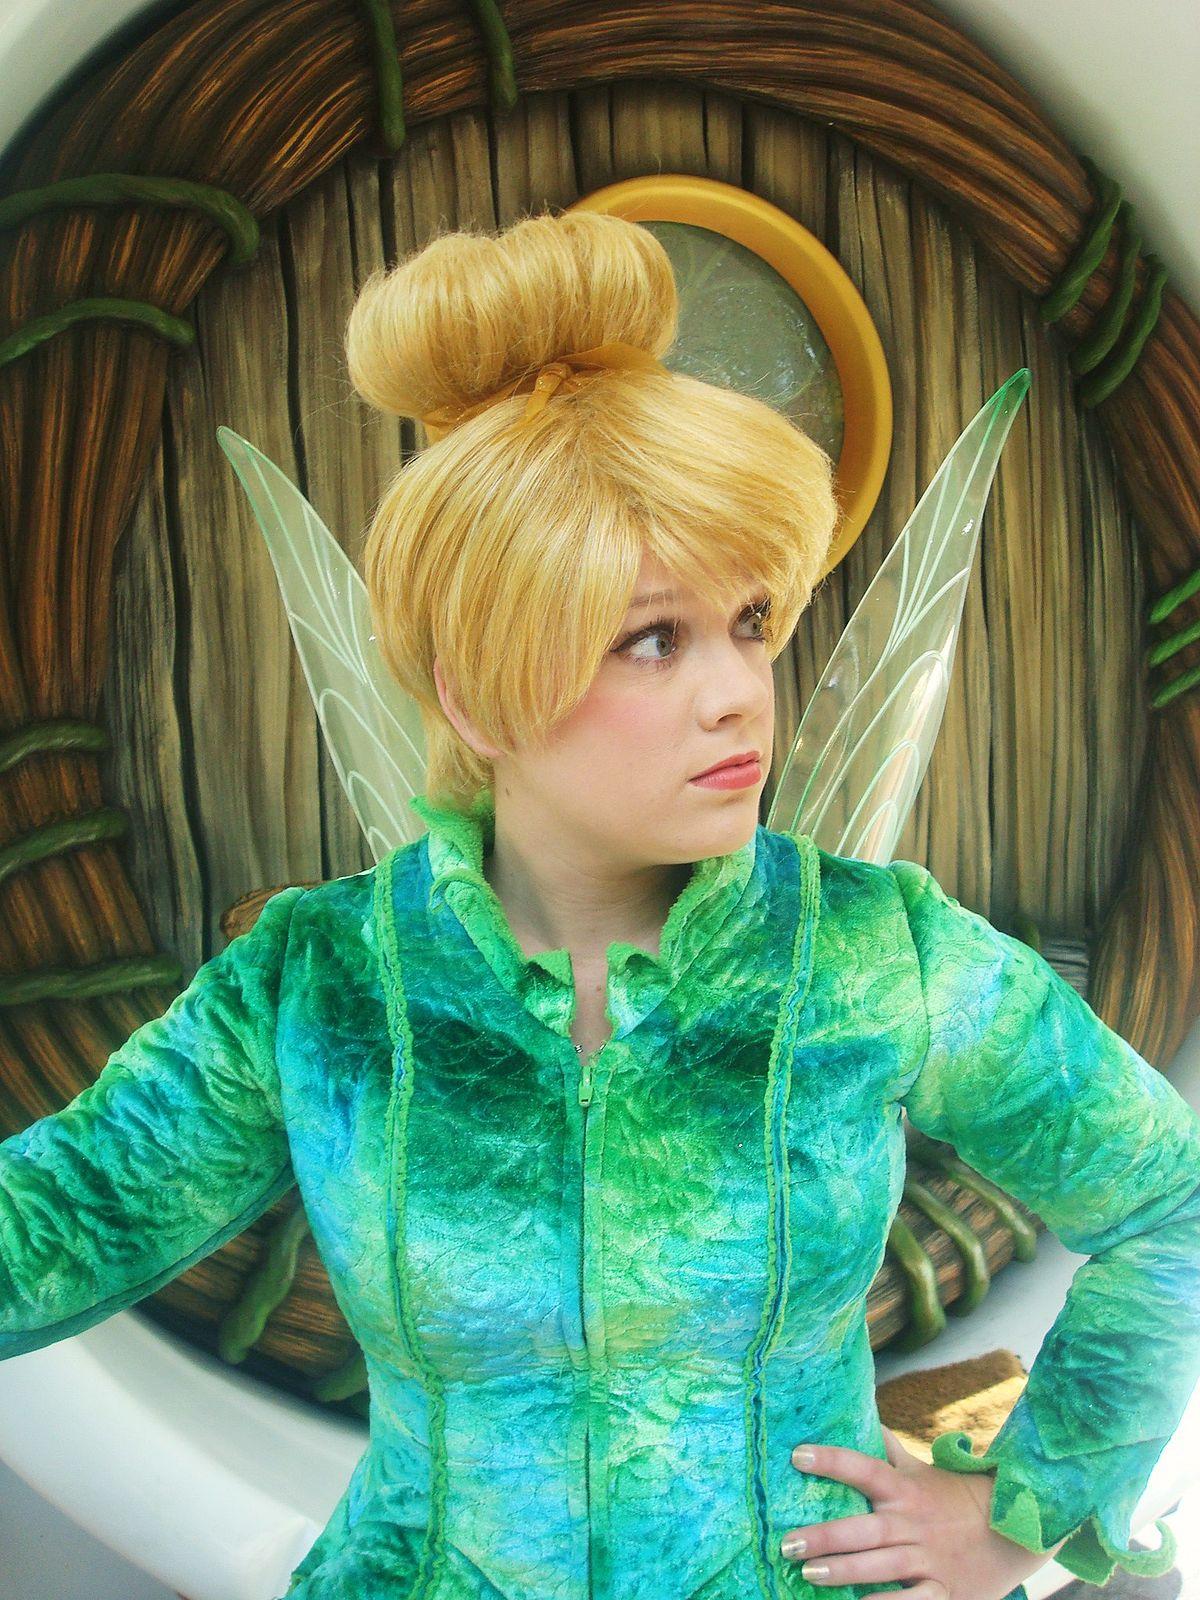 Amazon.com: Disney Parks Pixie Hollow Fairies Collectible 7 Piece ... | 1600x1200